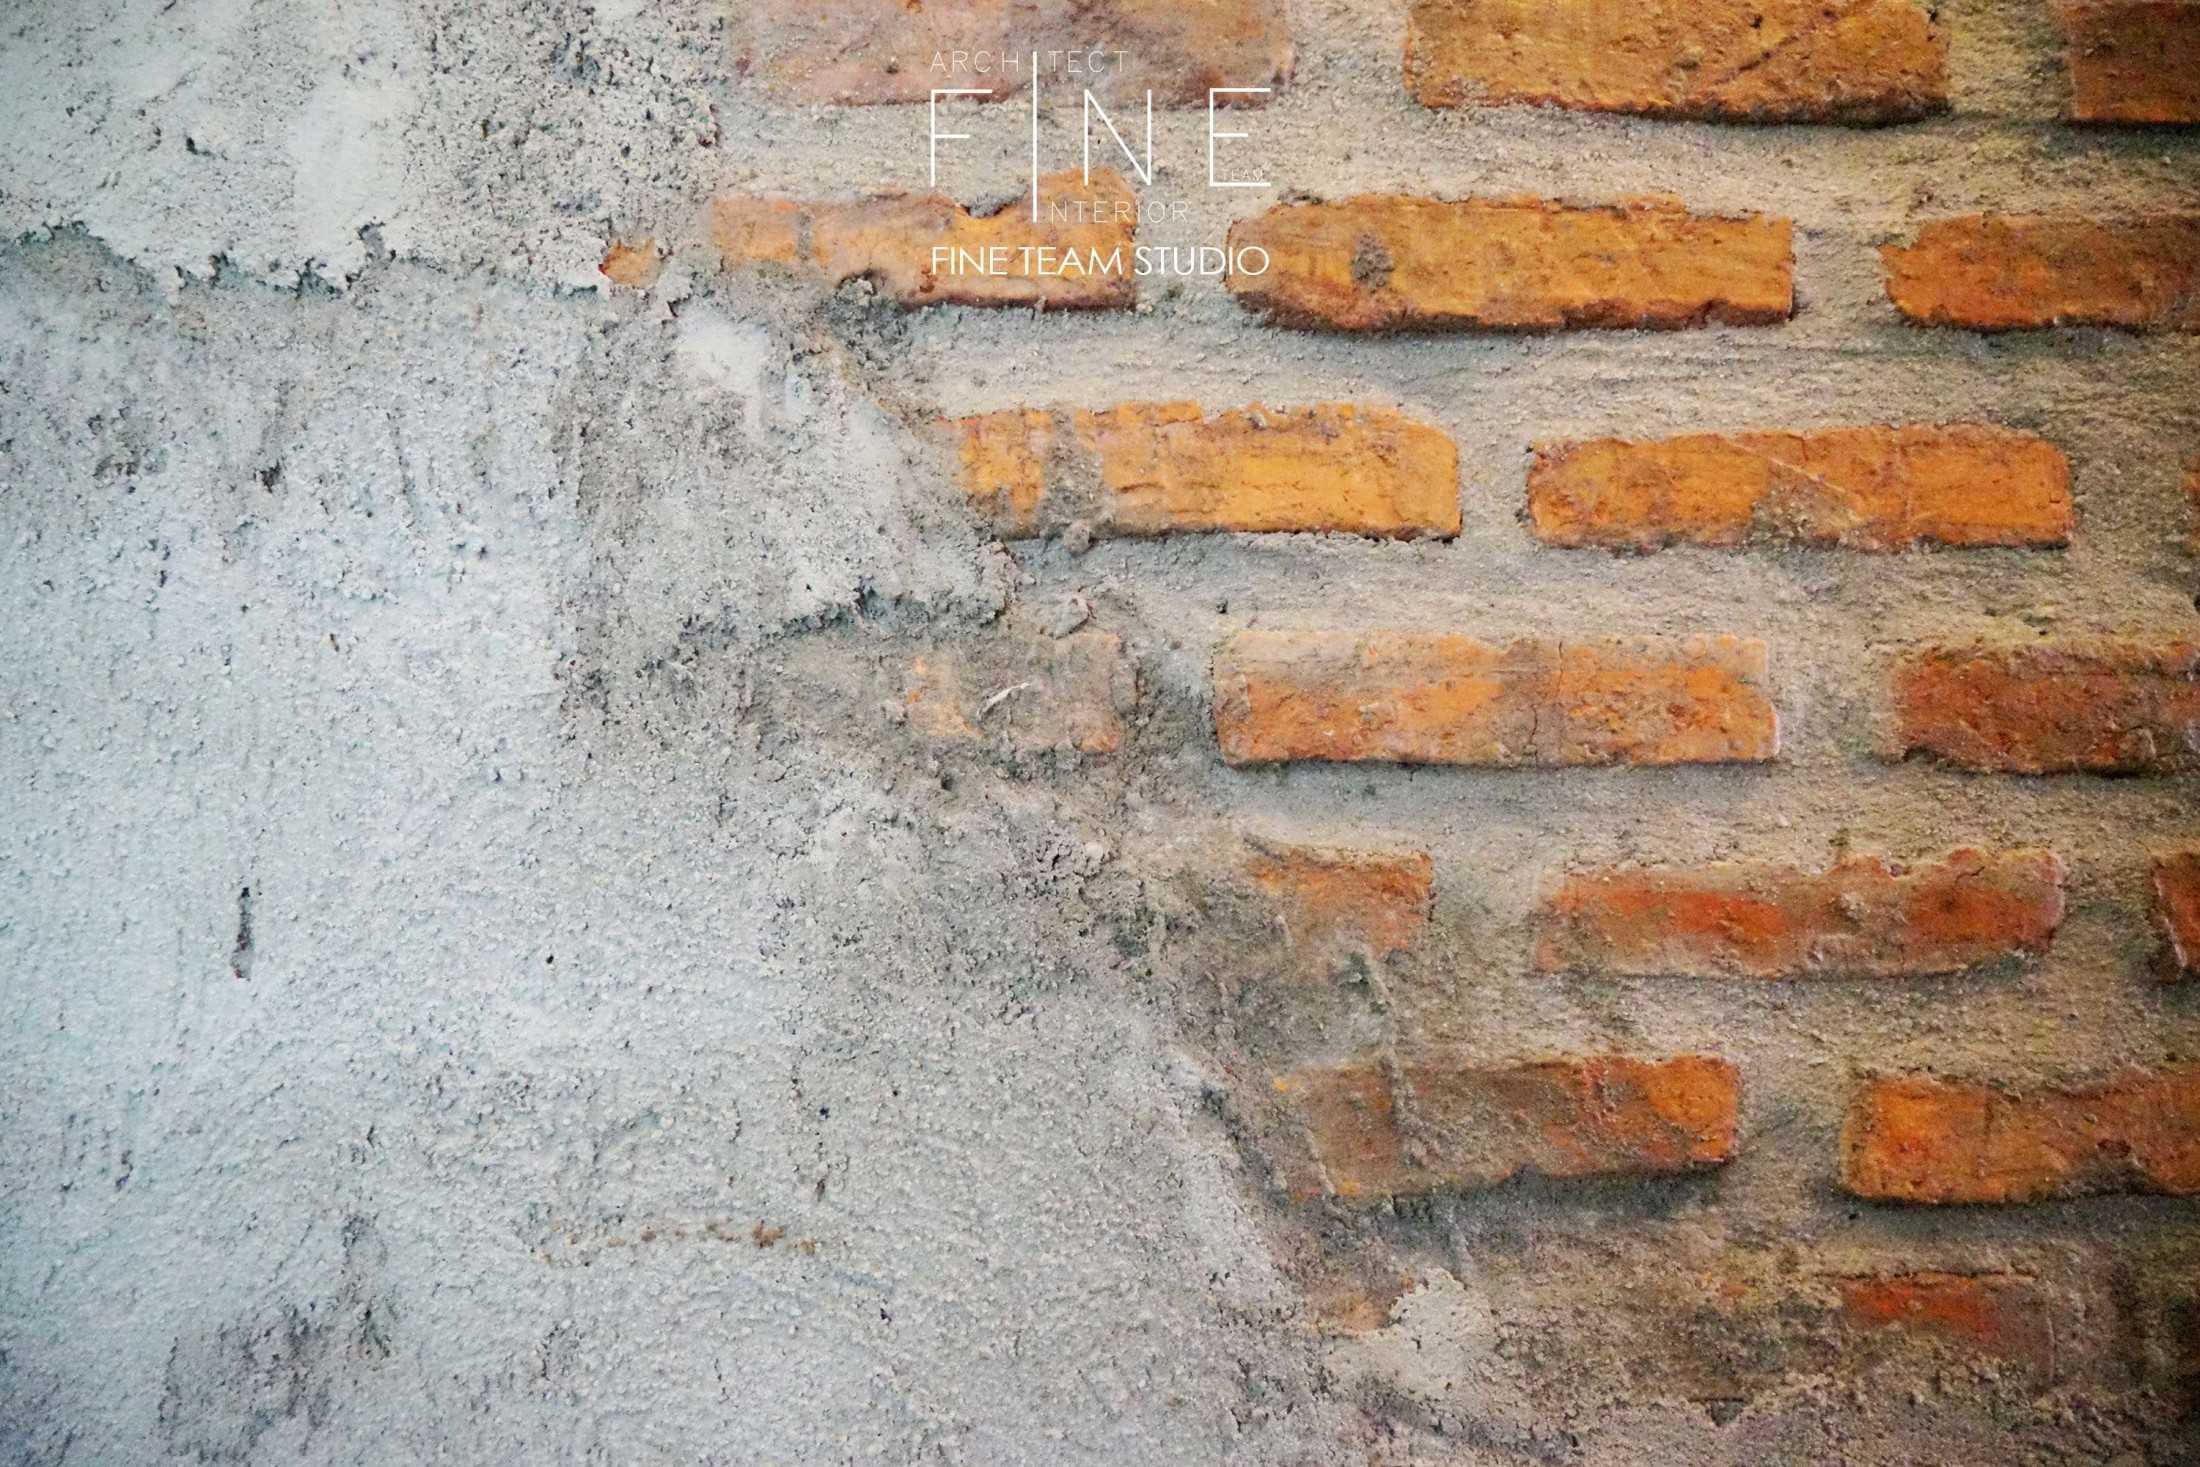 Fine Team Studio Delapan Gram Blok O, Jl. Pluit Karang Bar. No.6 No. 14, Rt.2/rw.8, Pluit, Penjaringan, Jakarta, Daerah Khusus Ibukota Jakarta 14450, Indonesia Blok O, Jl. Pluit Karang Bar. No.6 No. 14, Rt.2/rw.8, Pluit, Penjaringan, Jakarta, Daerah Khusus Ibukota Jakarta 14450, Indonesia Fine-Team-Studio-Delapan-Gram Industrial 56092